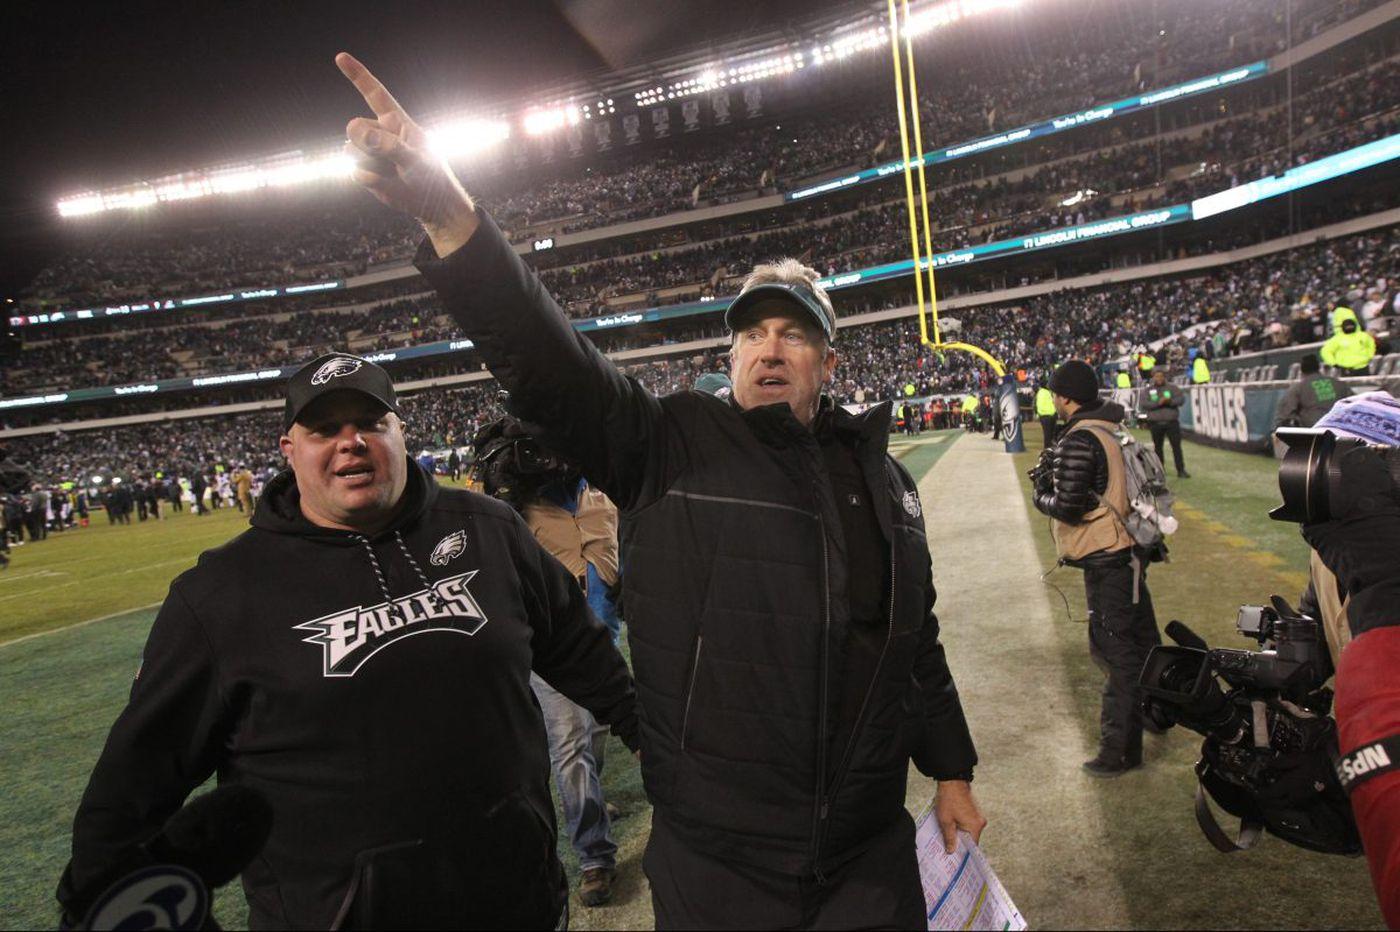 Eagles' NFC championship game berth is credit to Doug Pederson's steady hand, slick play calls | David Murphy